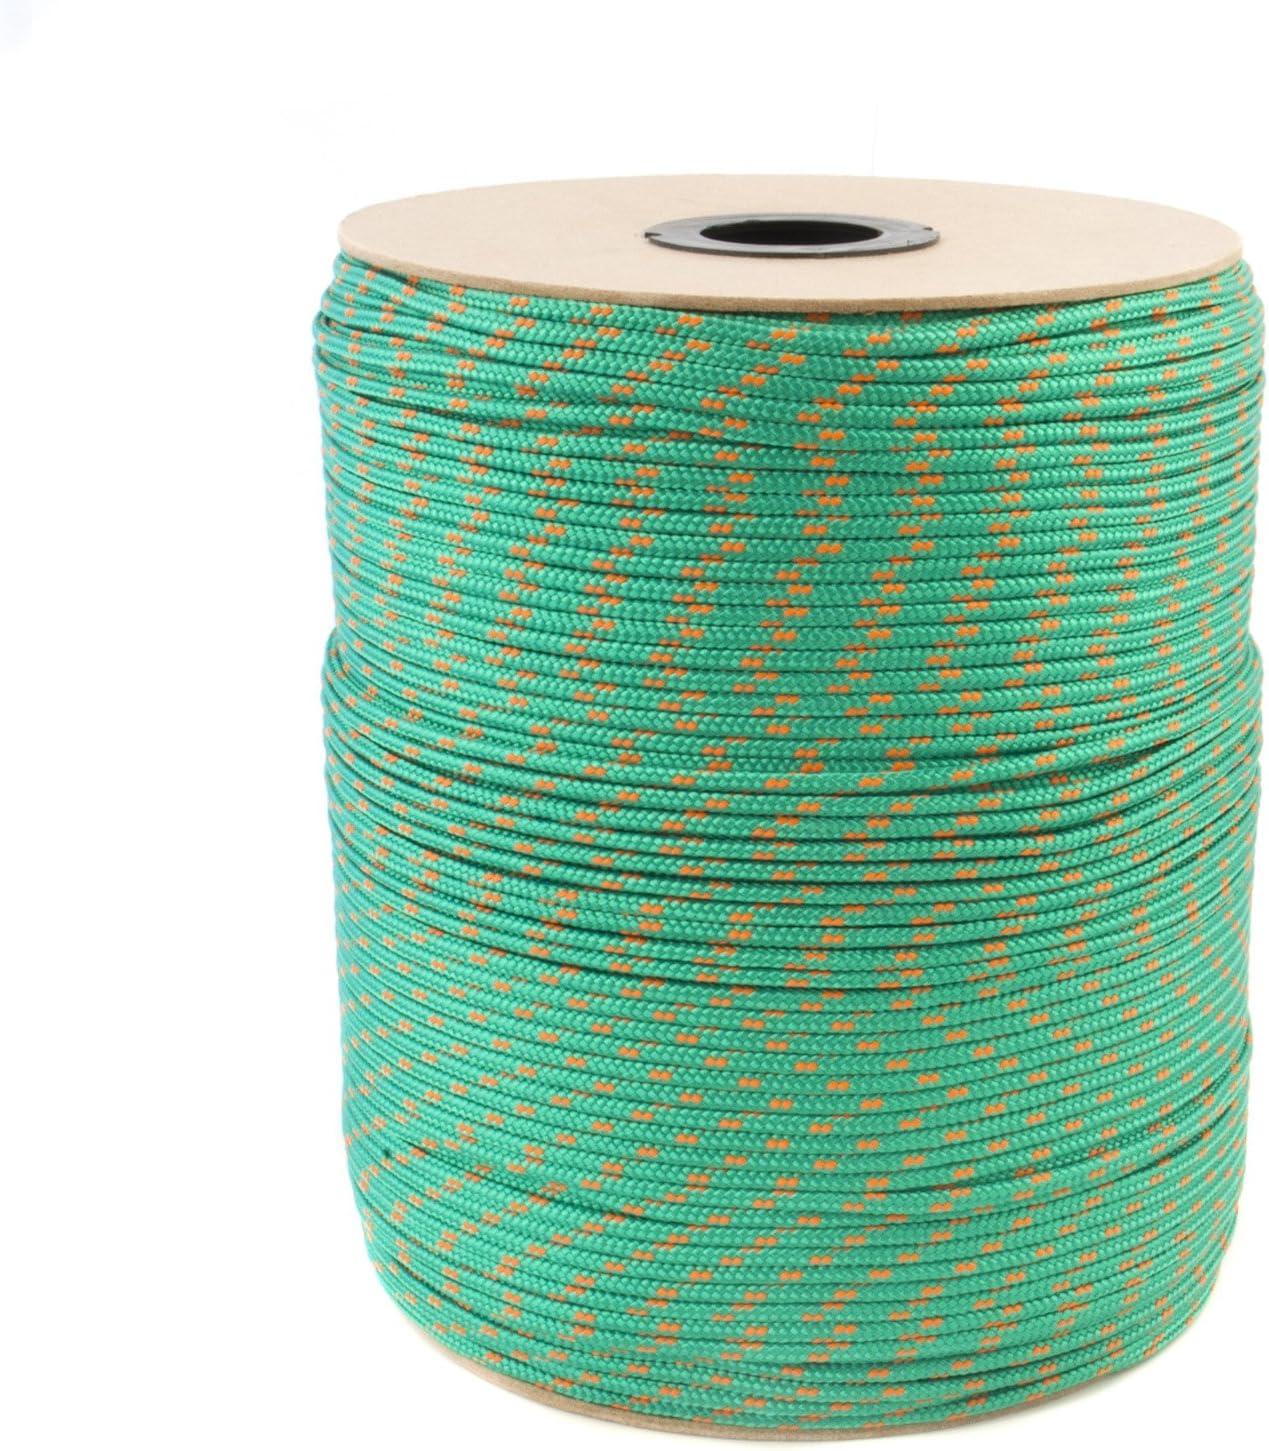 20m blanc corde polypropylene poly cordage 2mm plusieurs tailles et couleurs